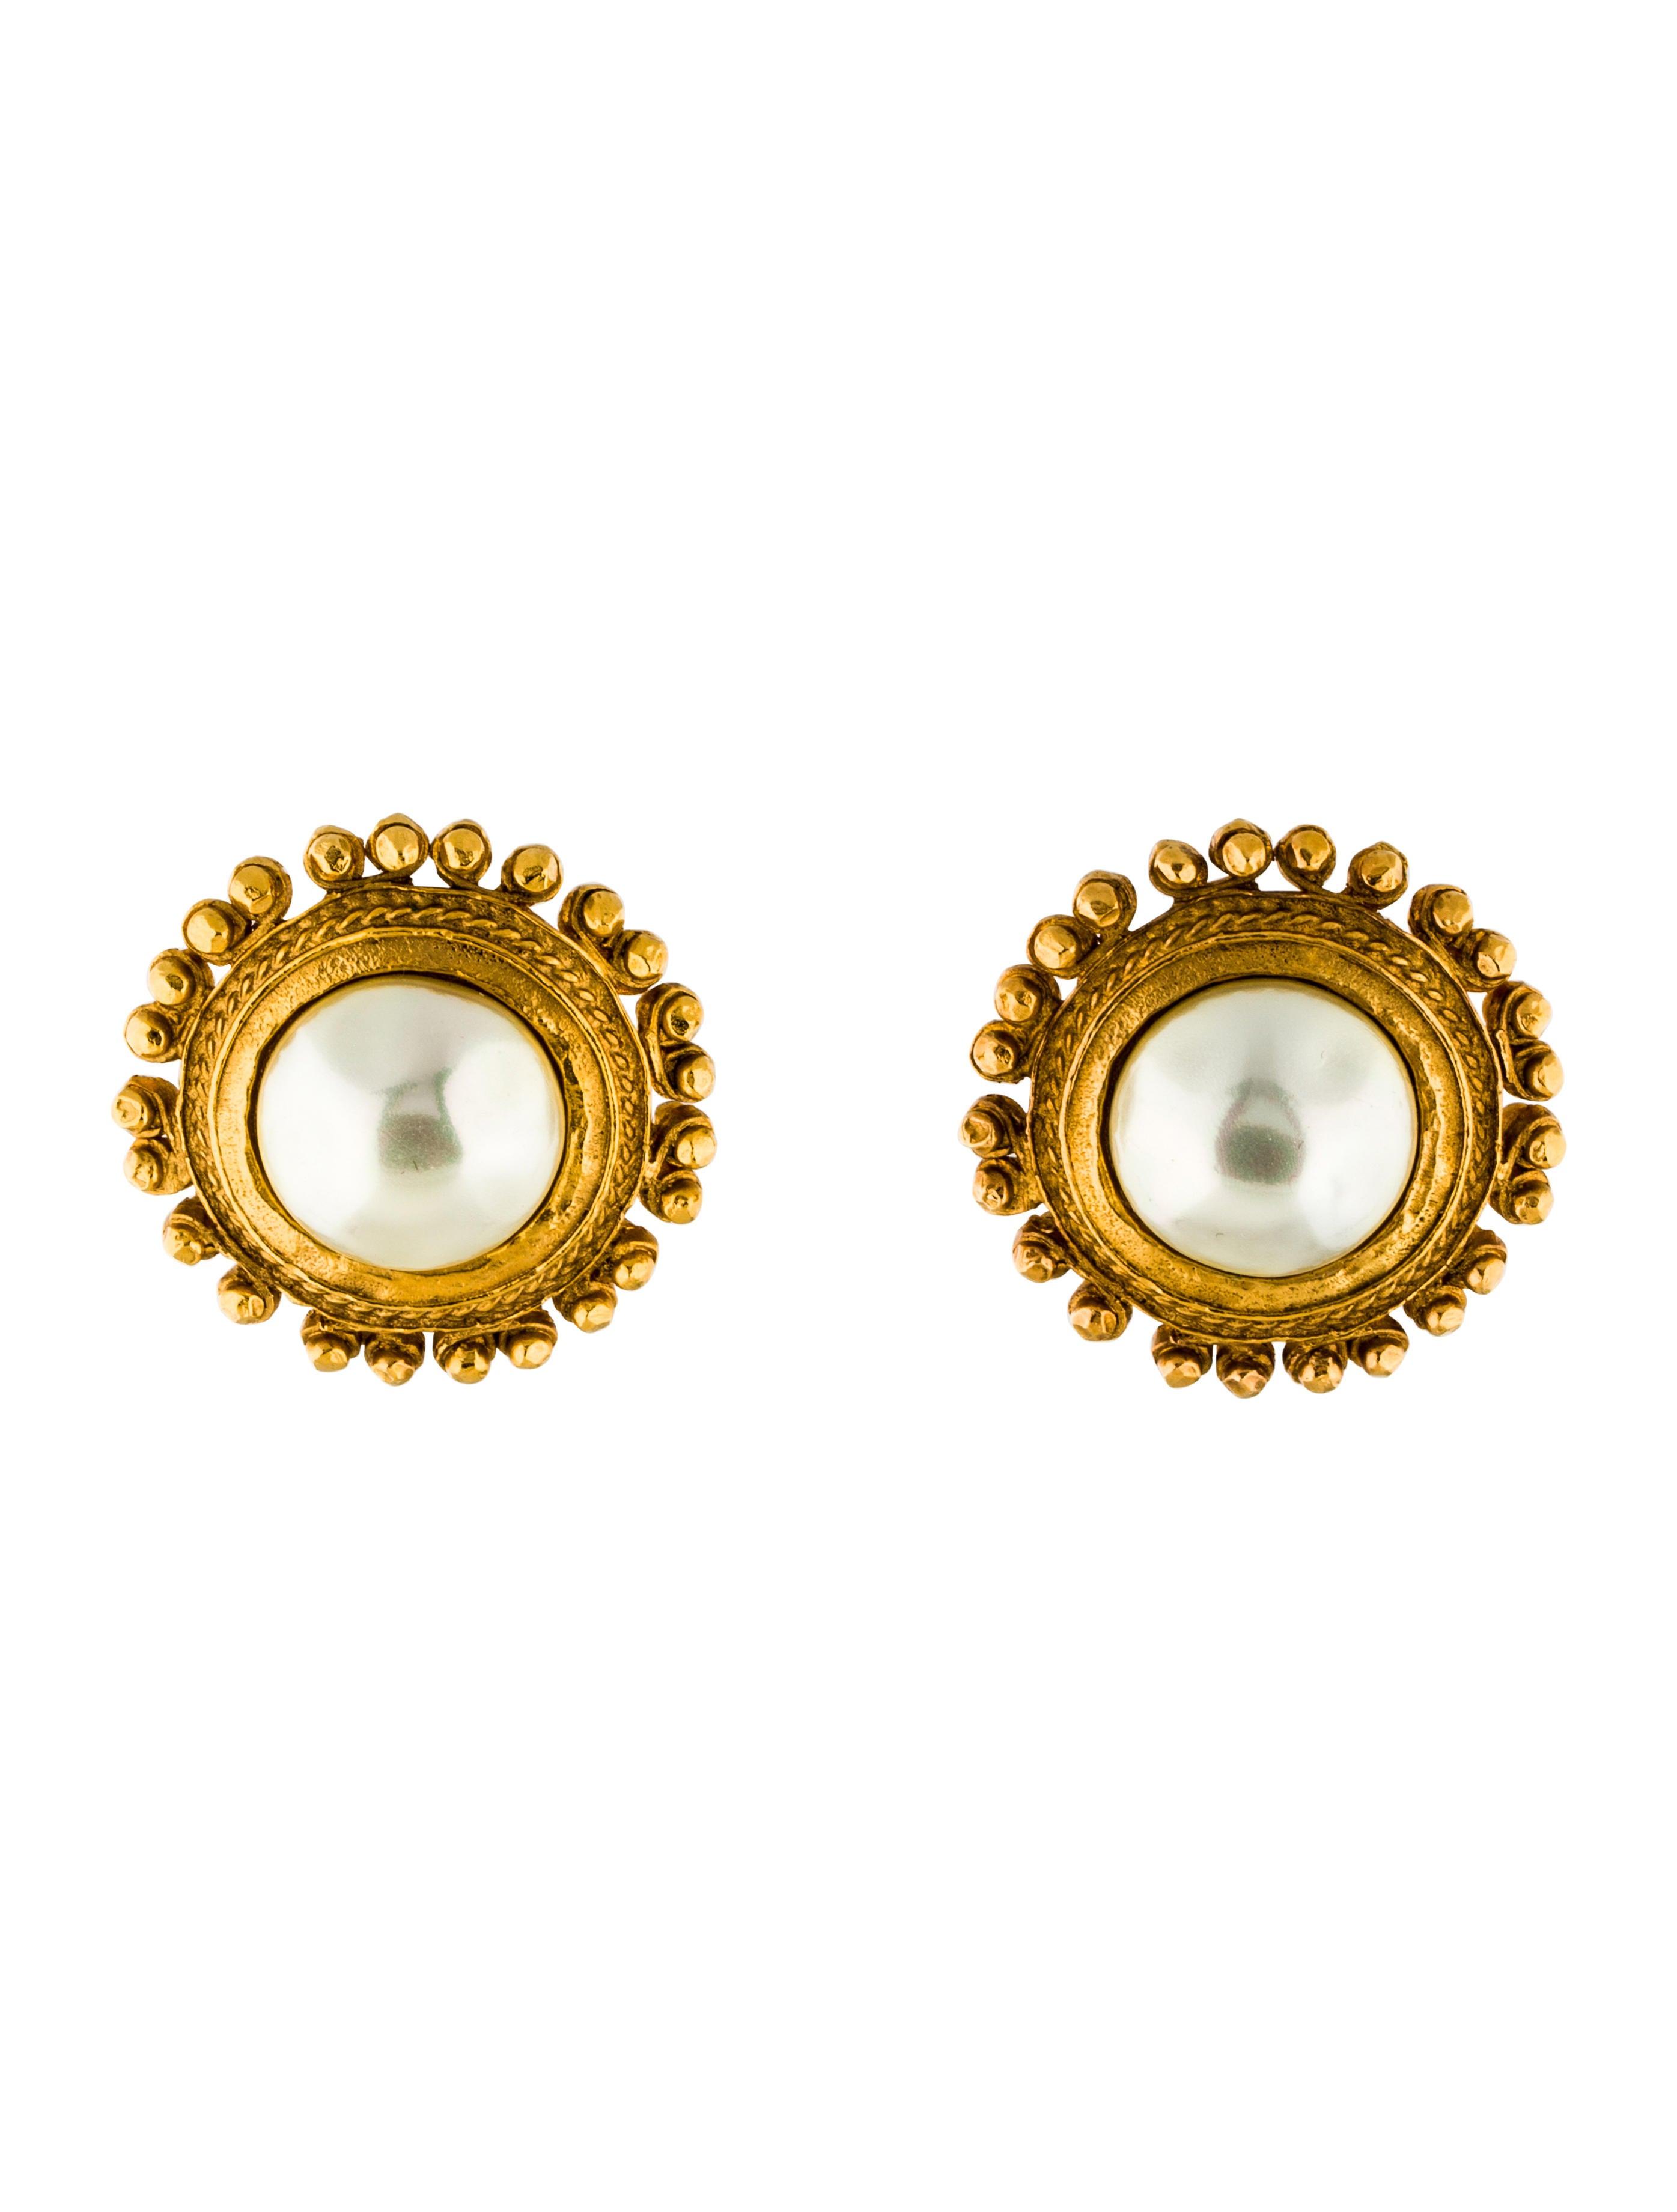 chanel faux pearl clip on earrings earrings cha172793. Black Bedroom Furniture Sets. Home Design Ideas